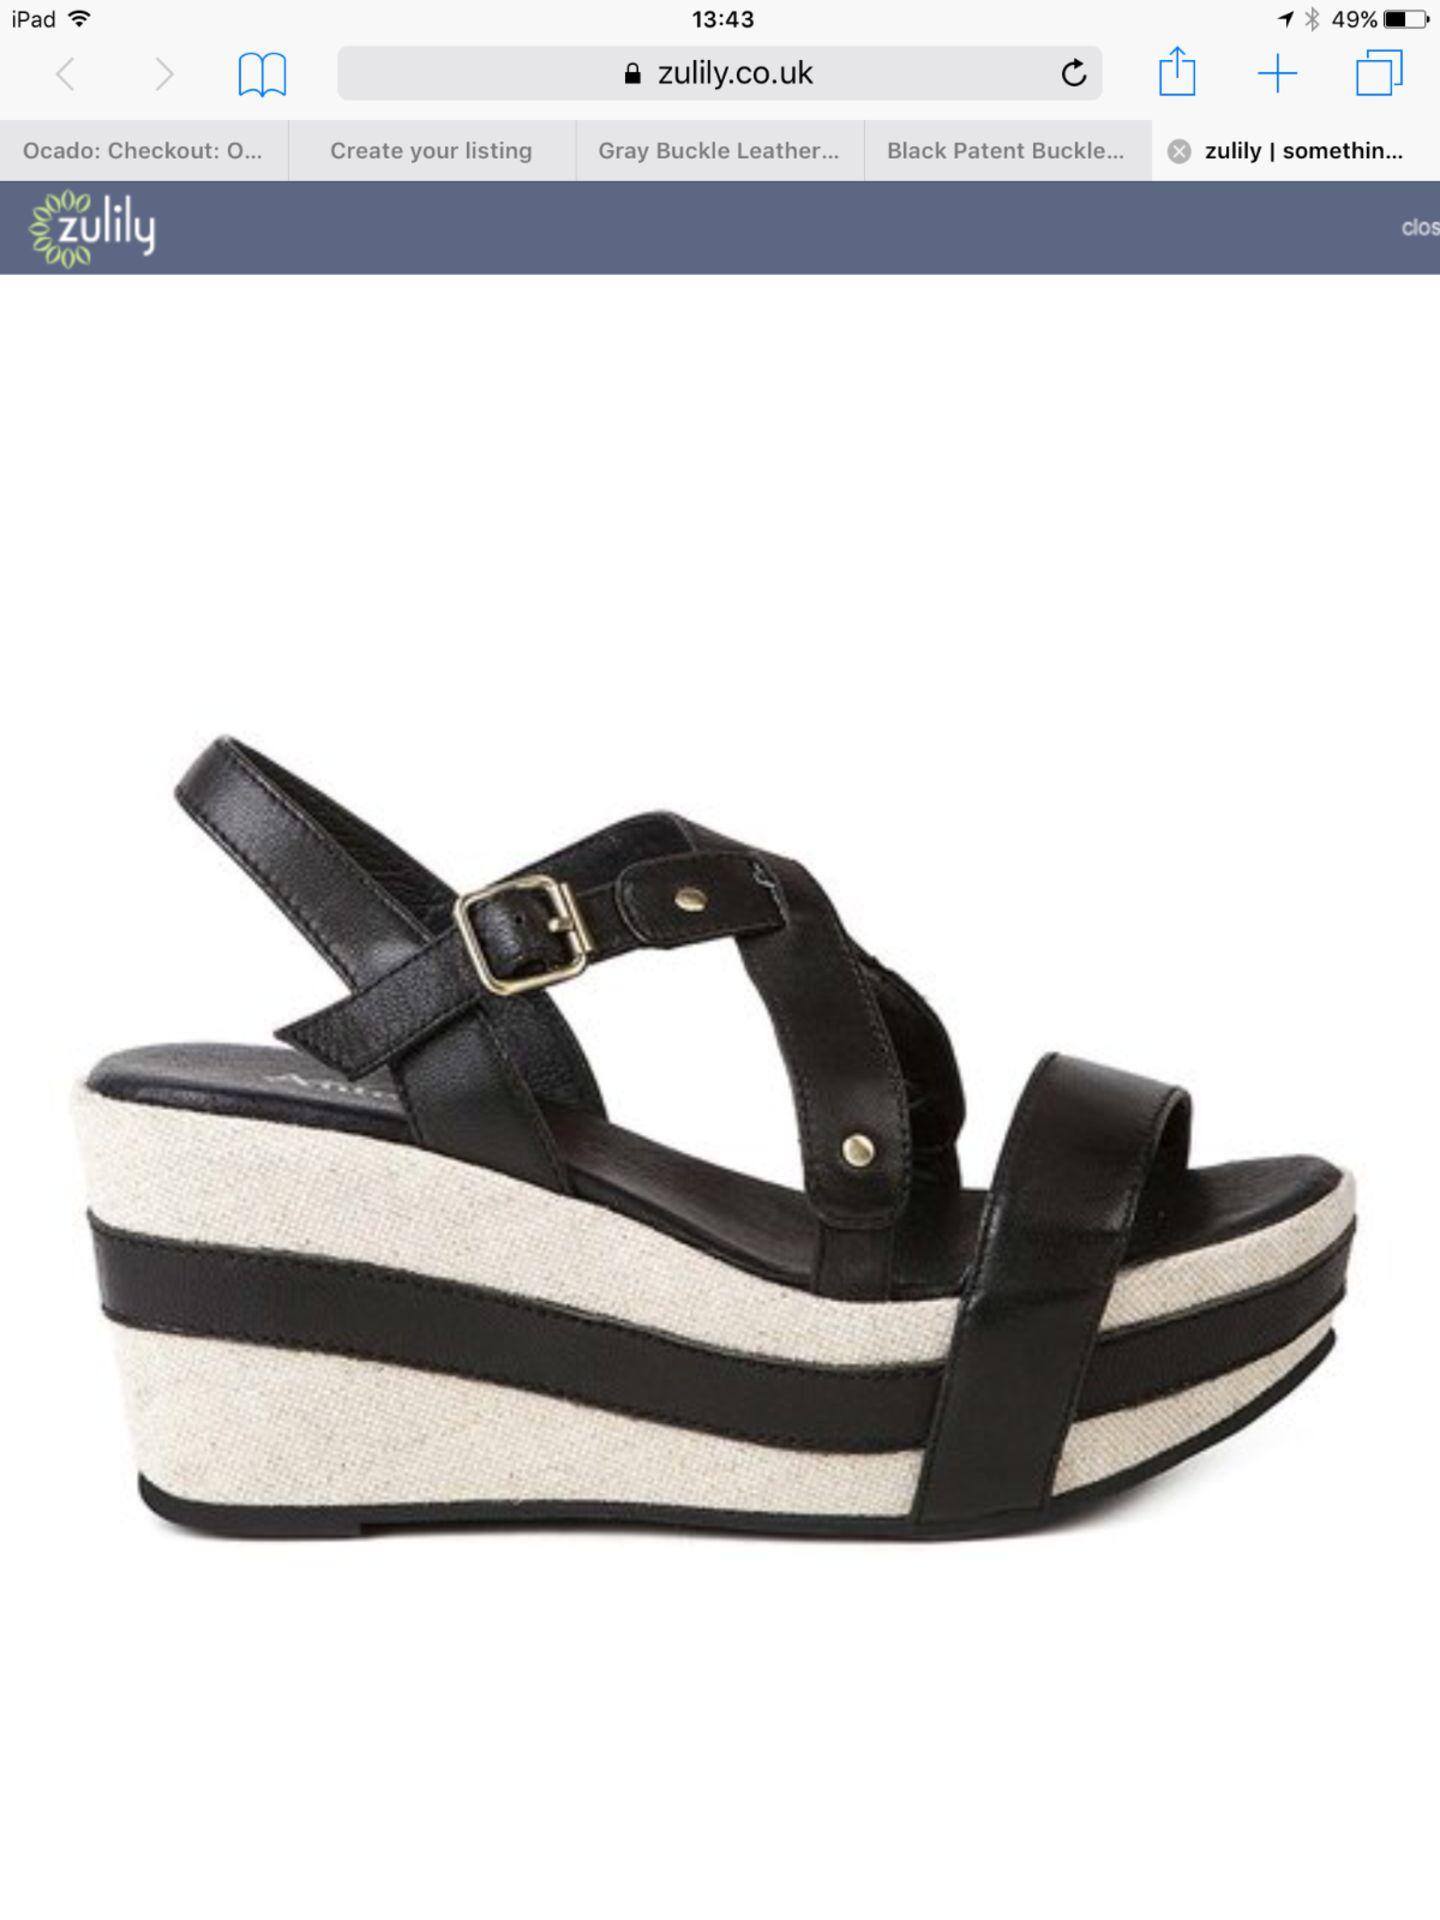 Lot 32 - Antelope Black Patent Buckle Platform Sandal, Size Eur 41 Us 10 Uk 8, Rrp £173.9 (New With Box) [